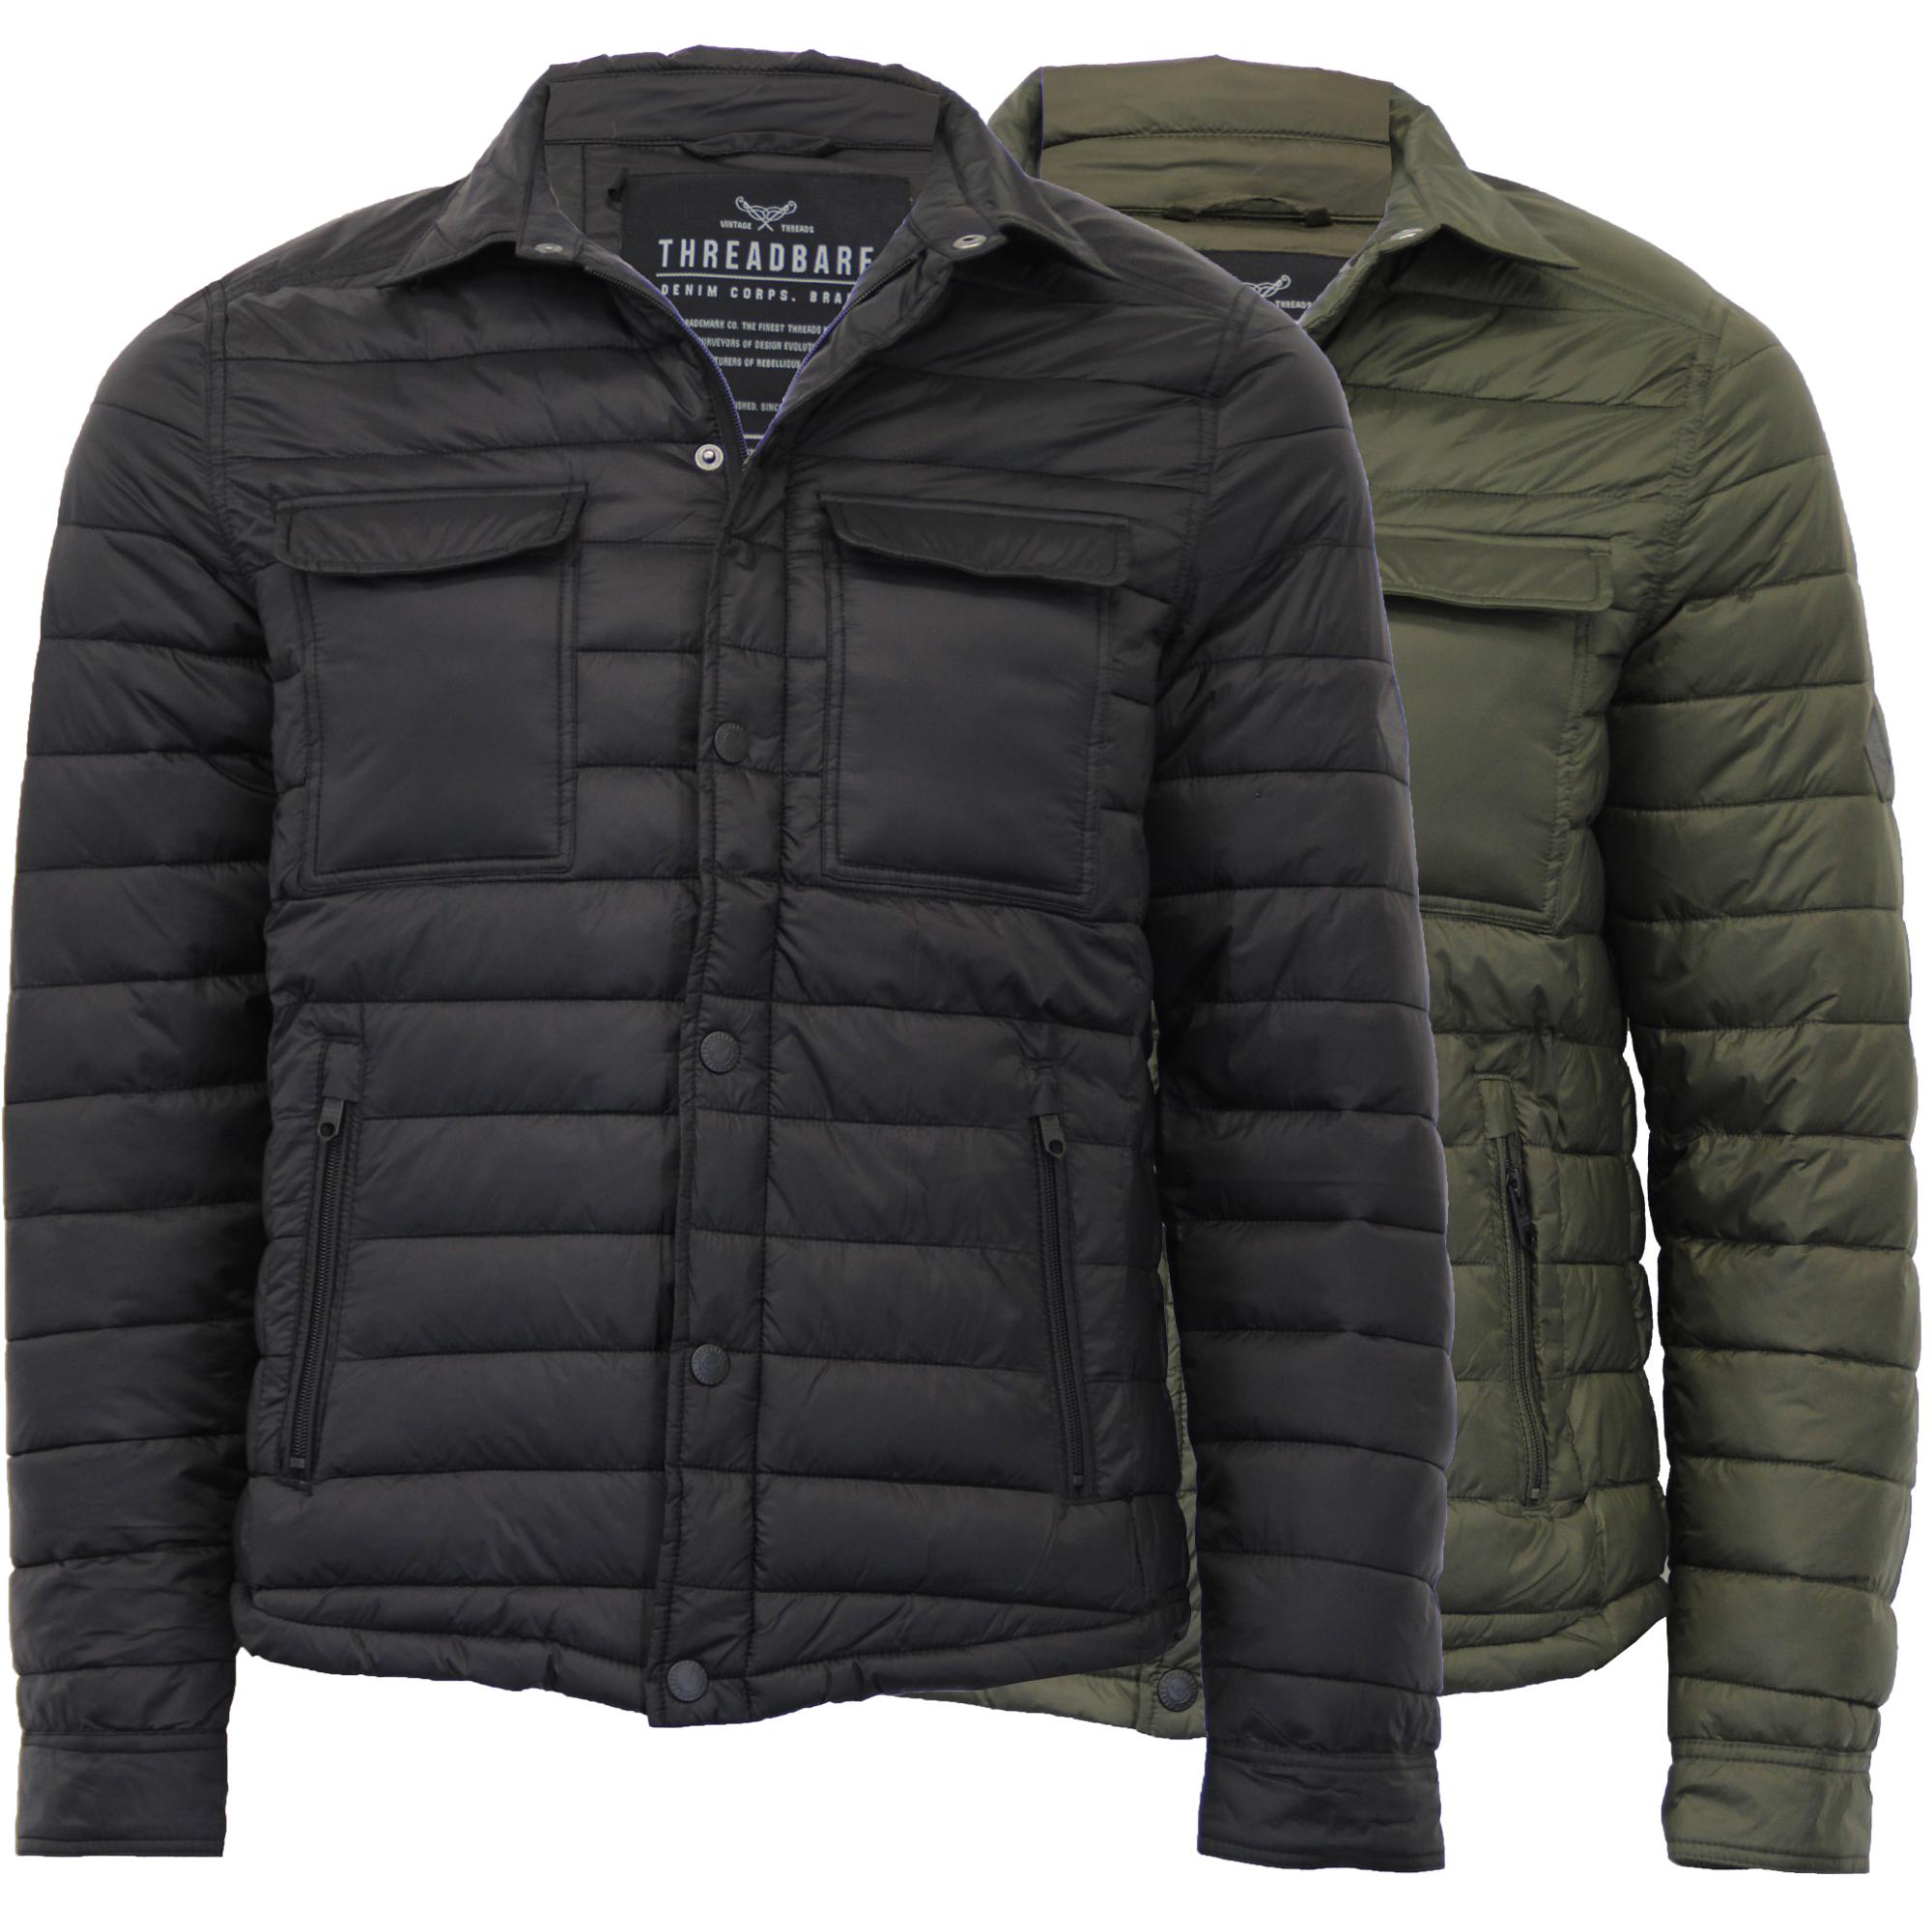 Threadbare Mens Padded Quilted Jacket Coat Warm Lightweight Winter Fashion Hippo